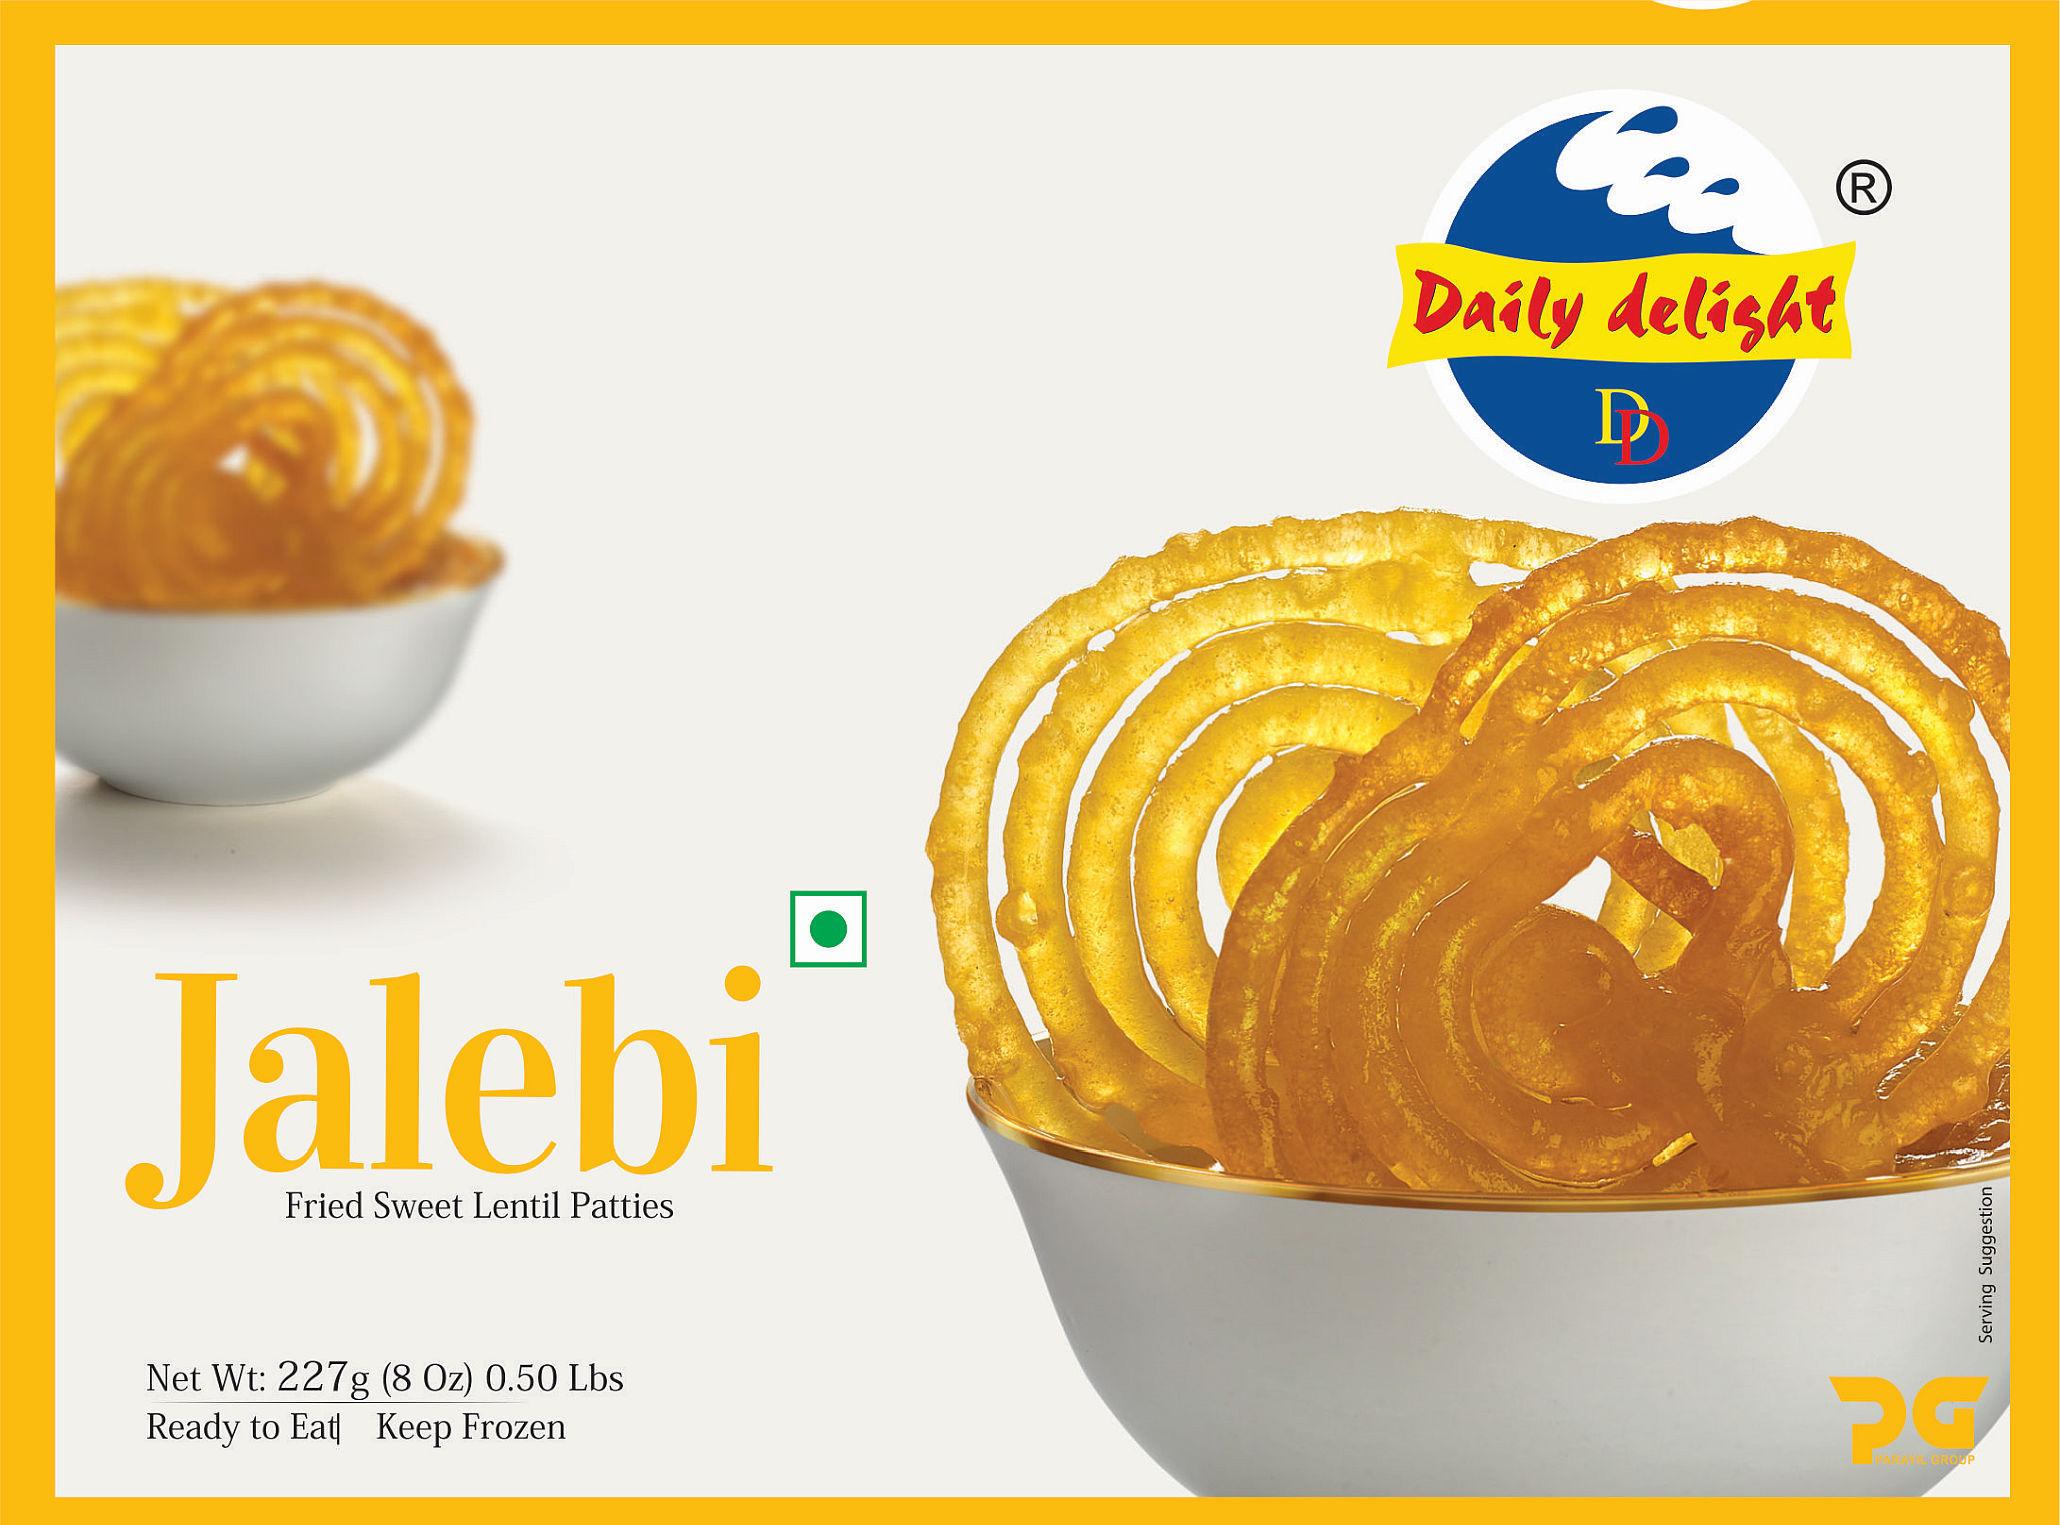 Daily Delight Jalebi Yellow